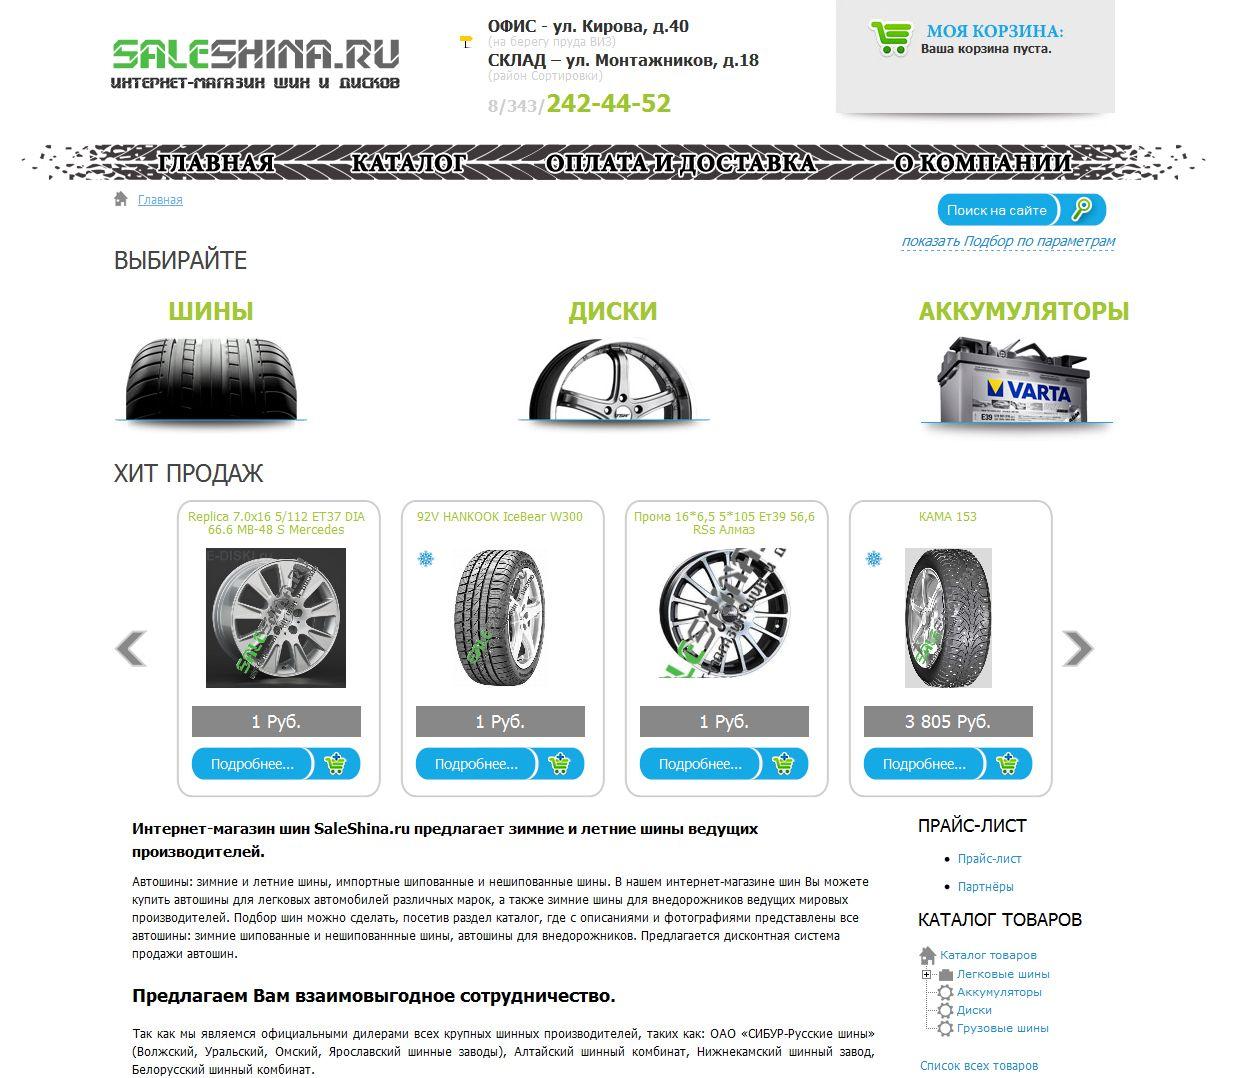 Интернет-магазин Saleshina